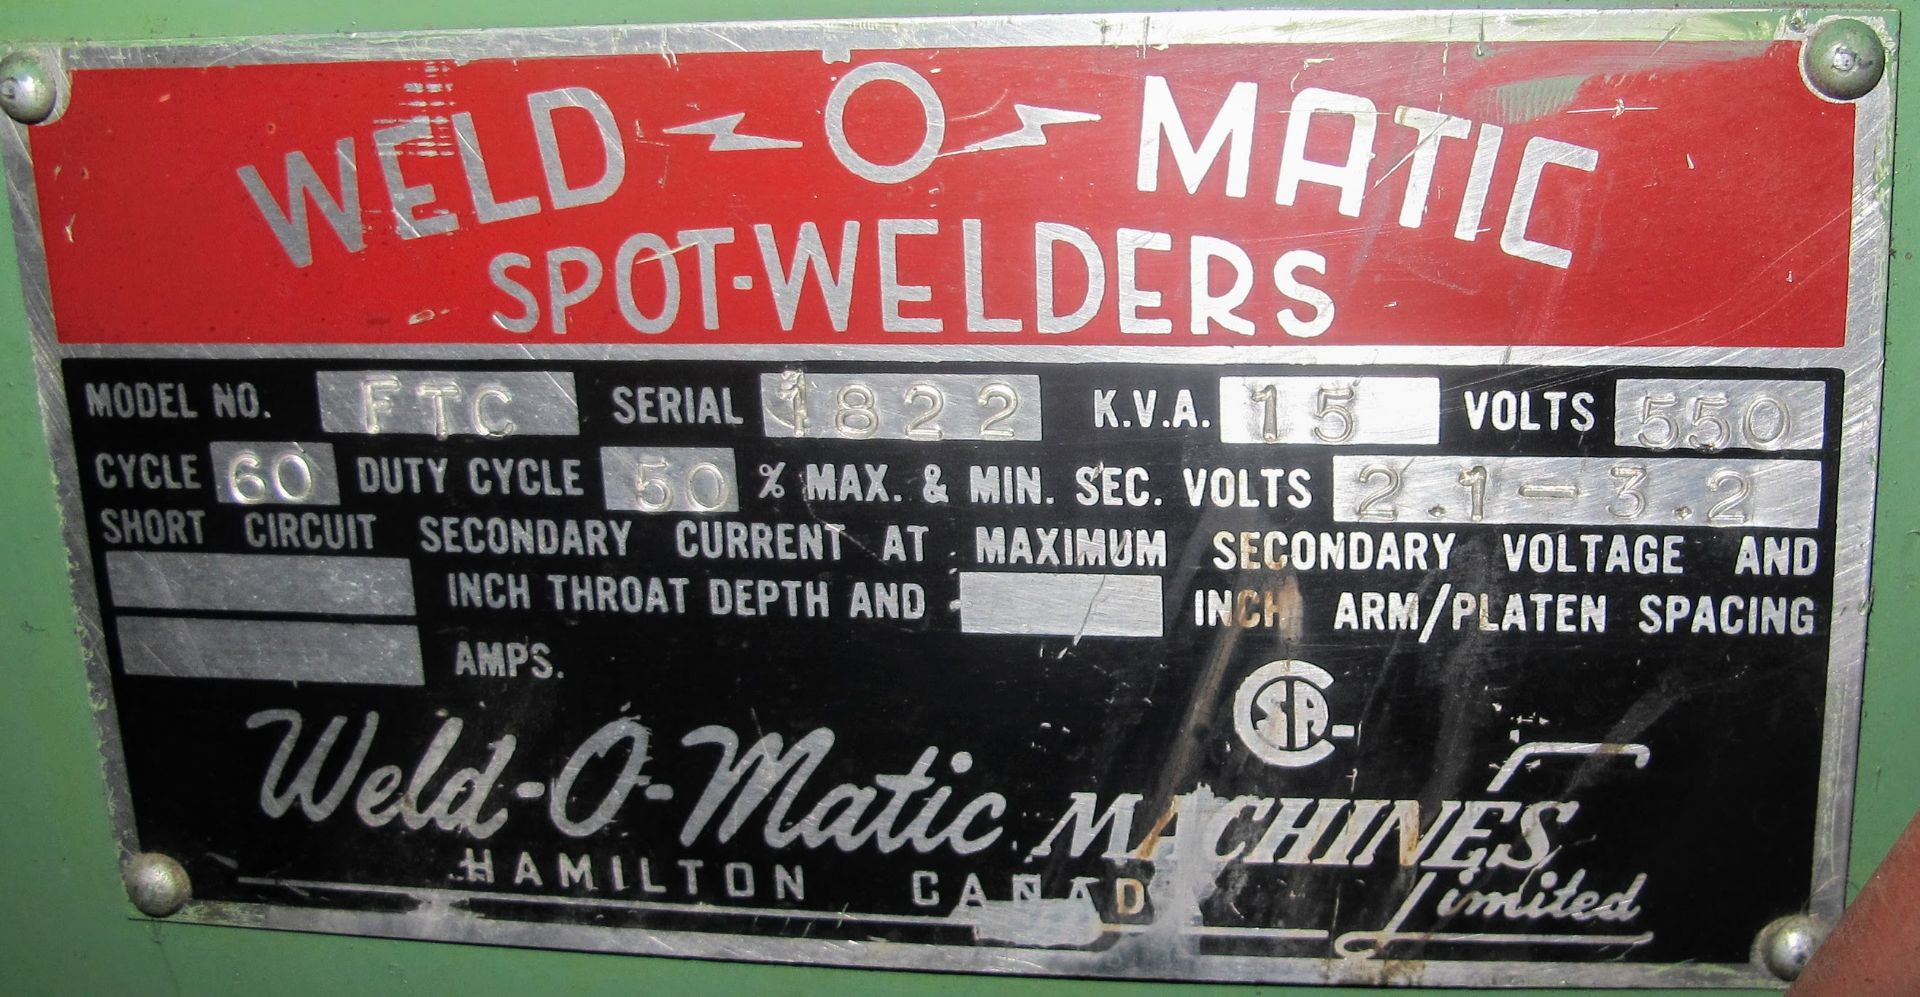 "Lot 24 - WELD-O-MATIC FTC SPOT WELDER, 15KVA, 12"" THROAT, S/N 1822"